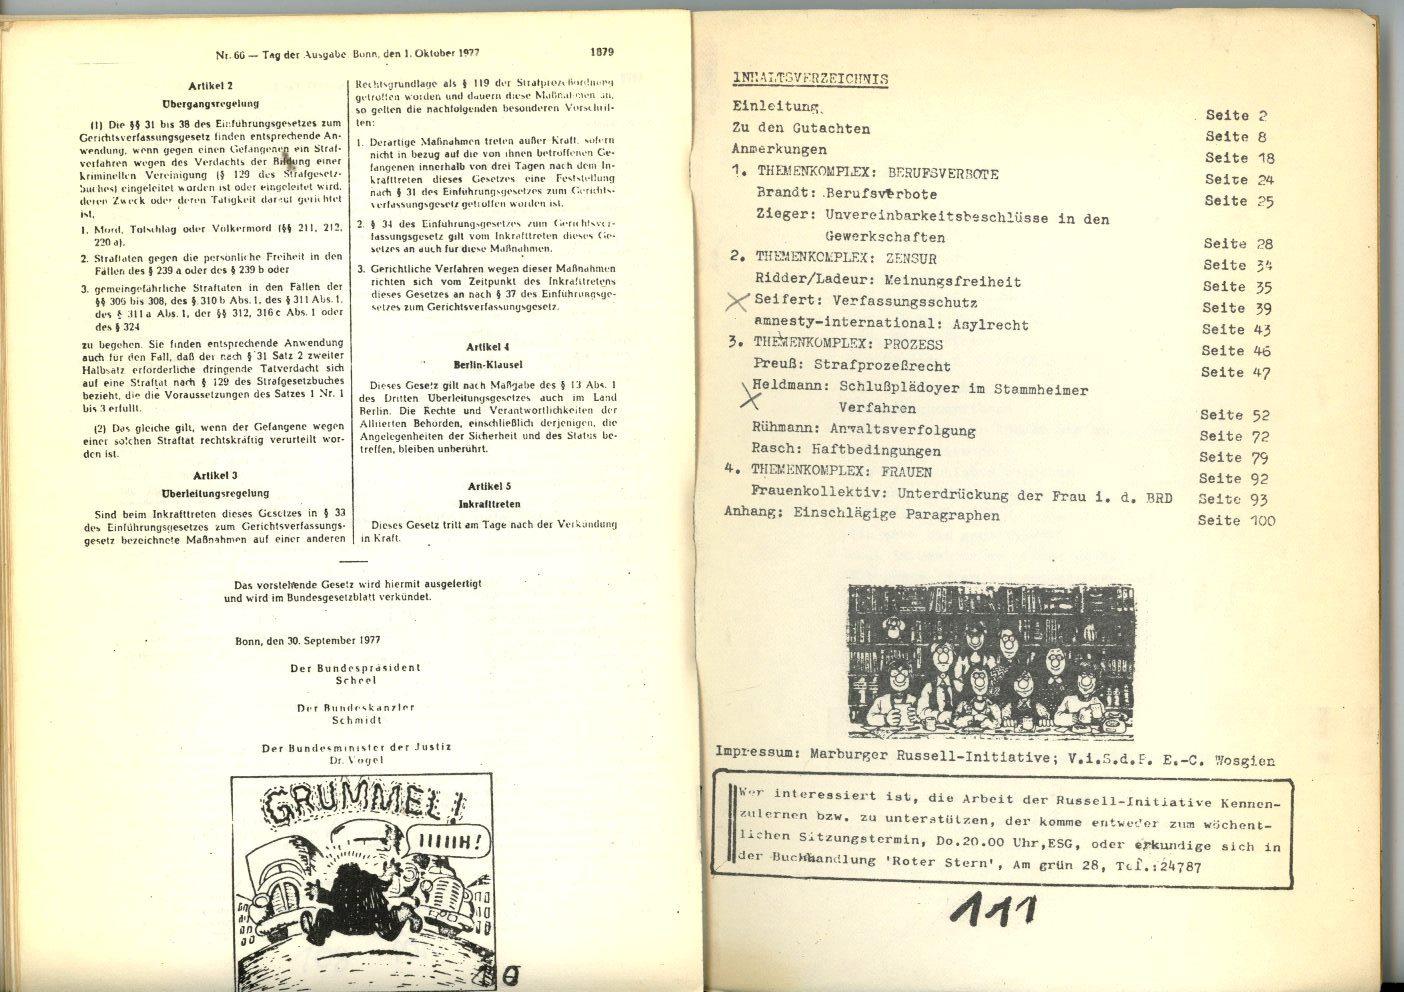 Marburg_Russell_Initiative_1978_57